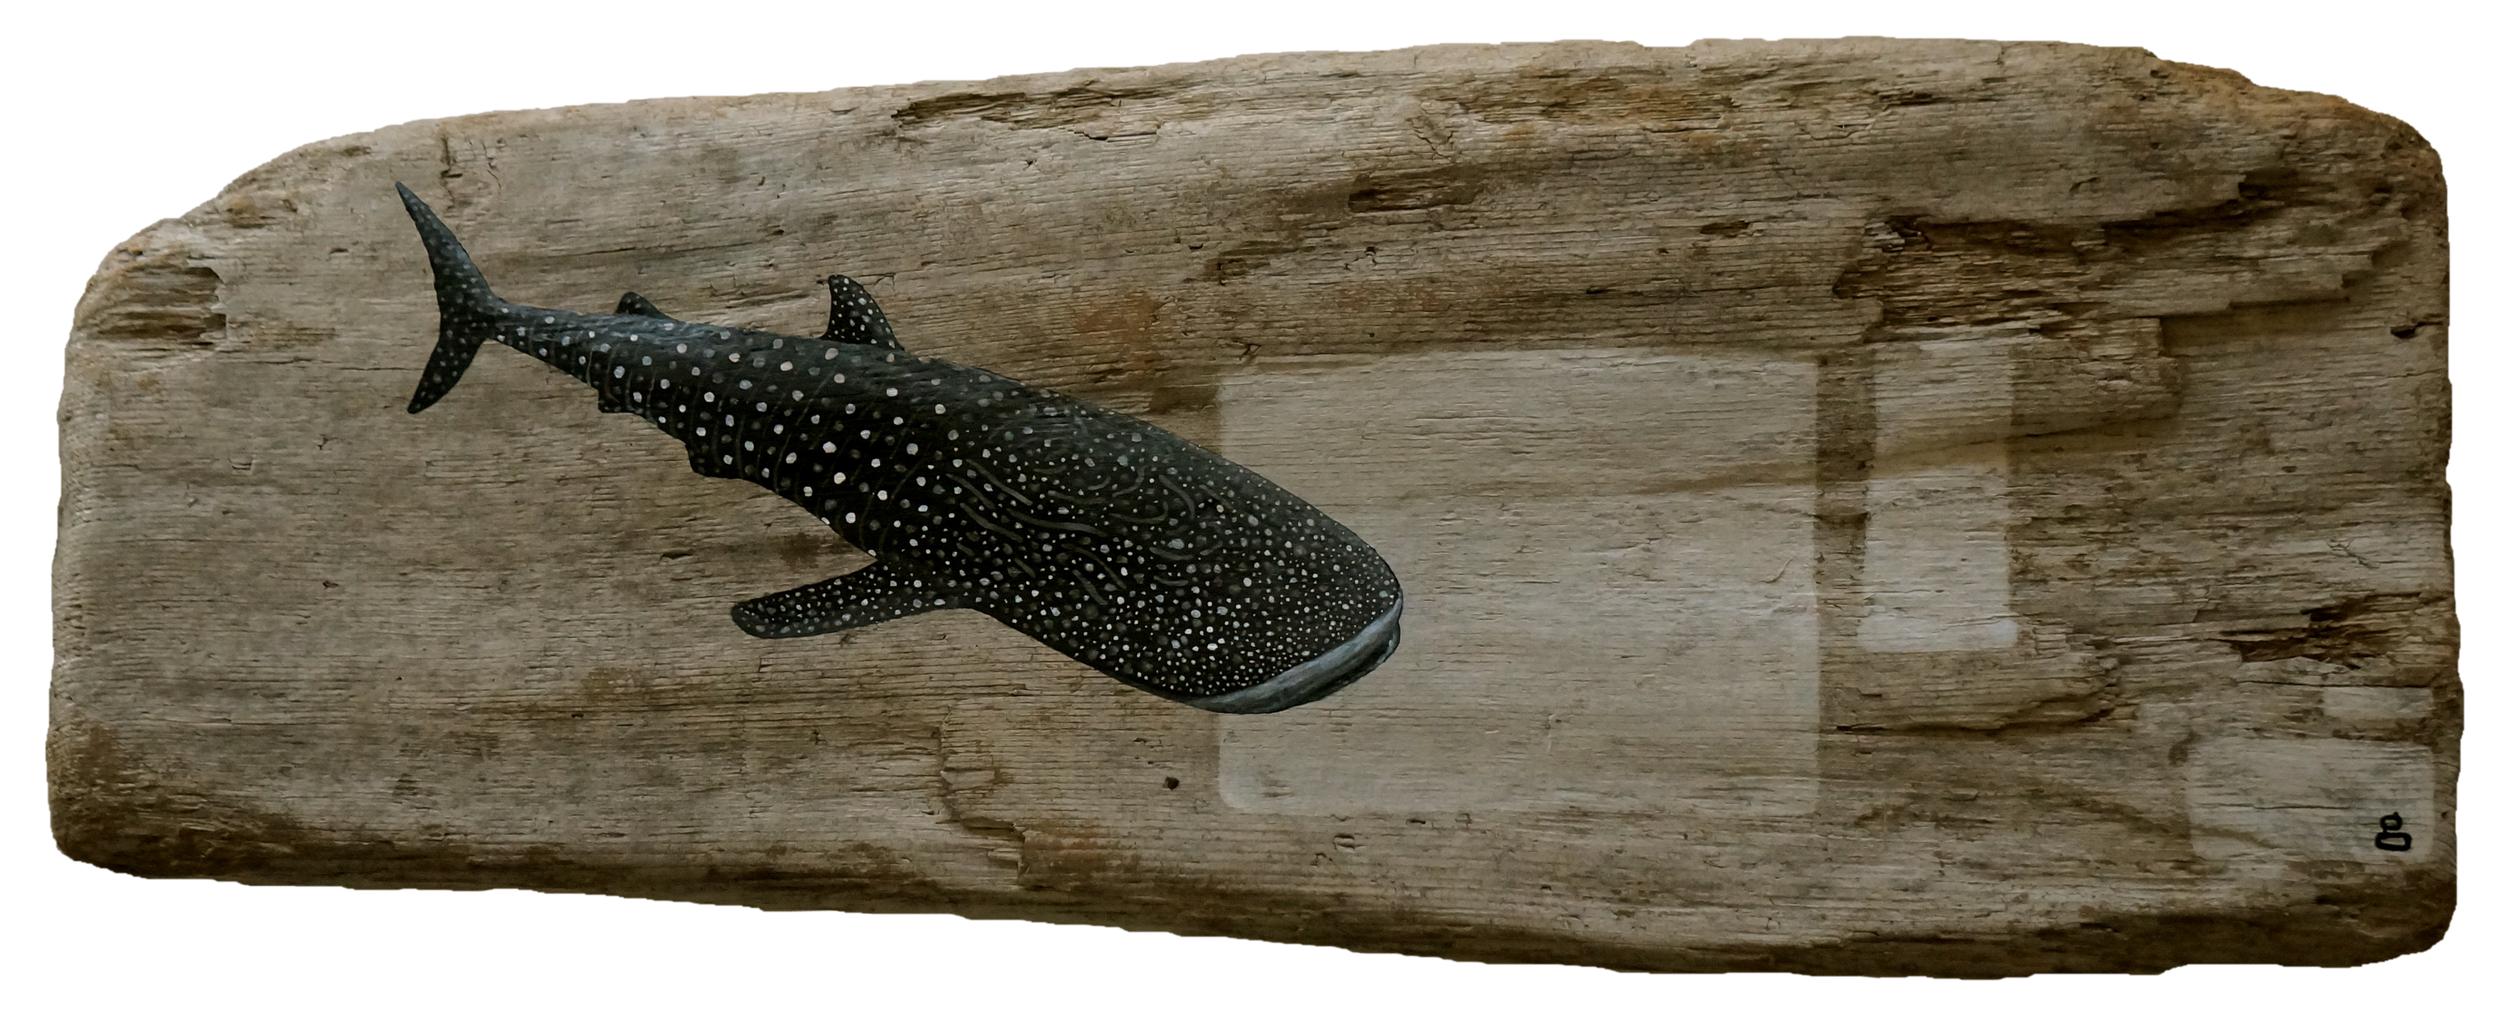 Whale Shark Galactic Cartograph